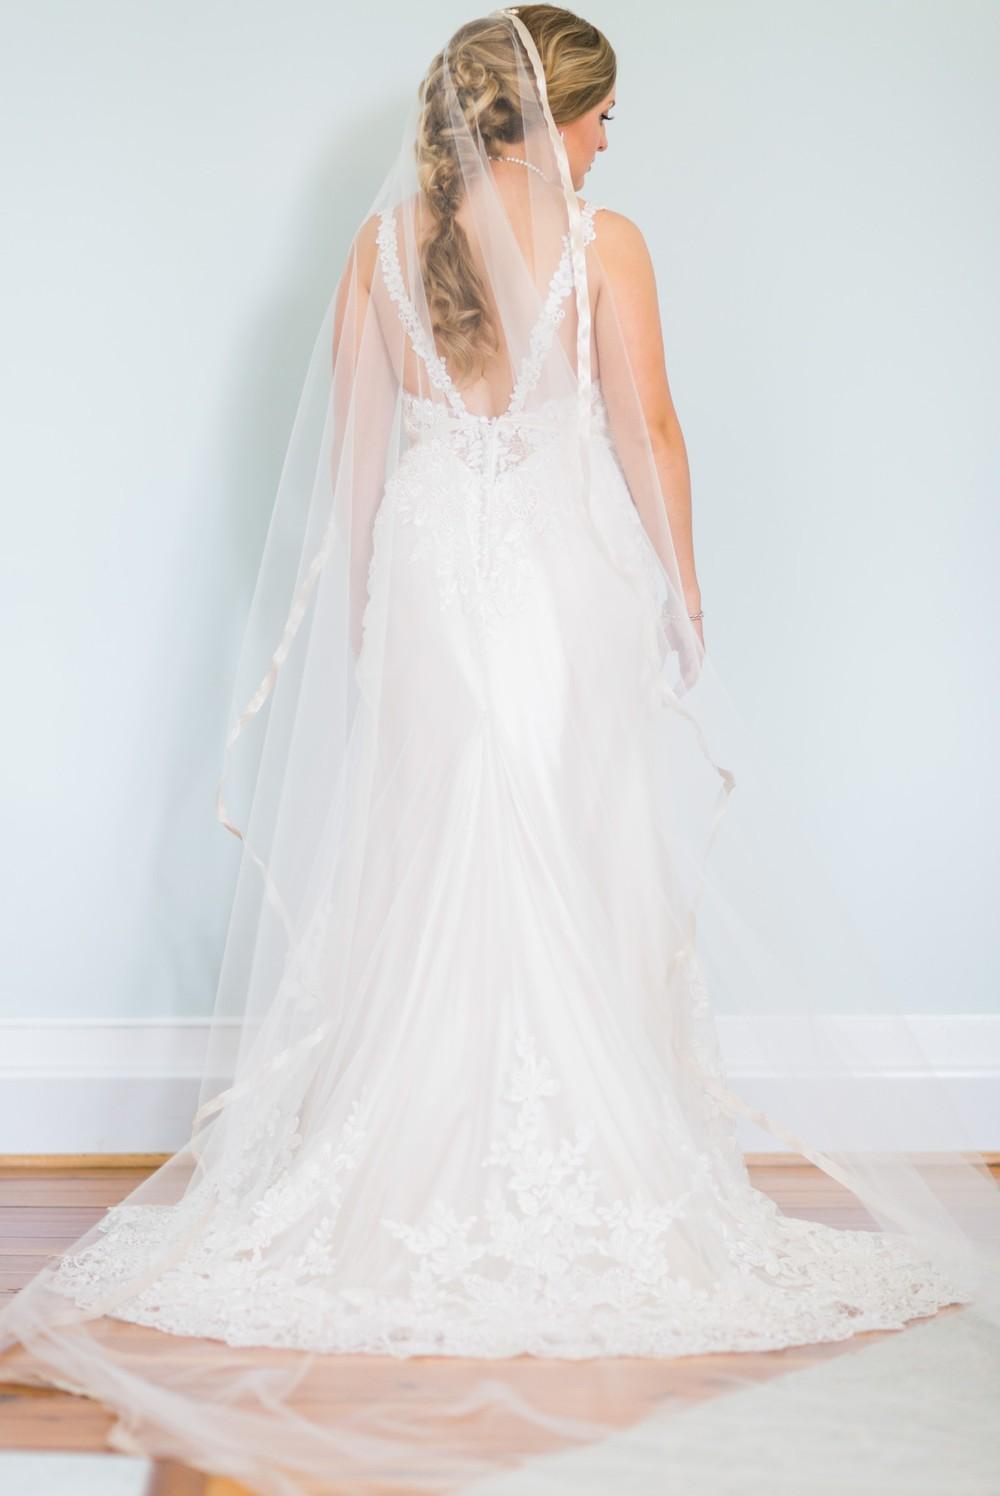 trivium_lynchburg_va_wedding_estate_wedding_photography_wedding_photographers (21).jpg